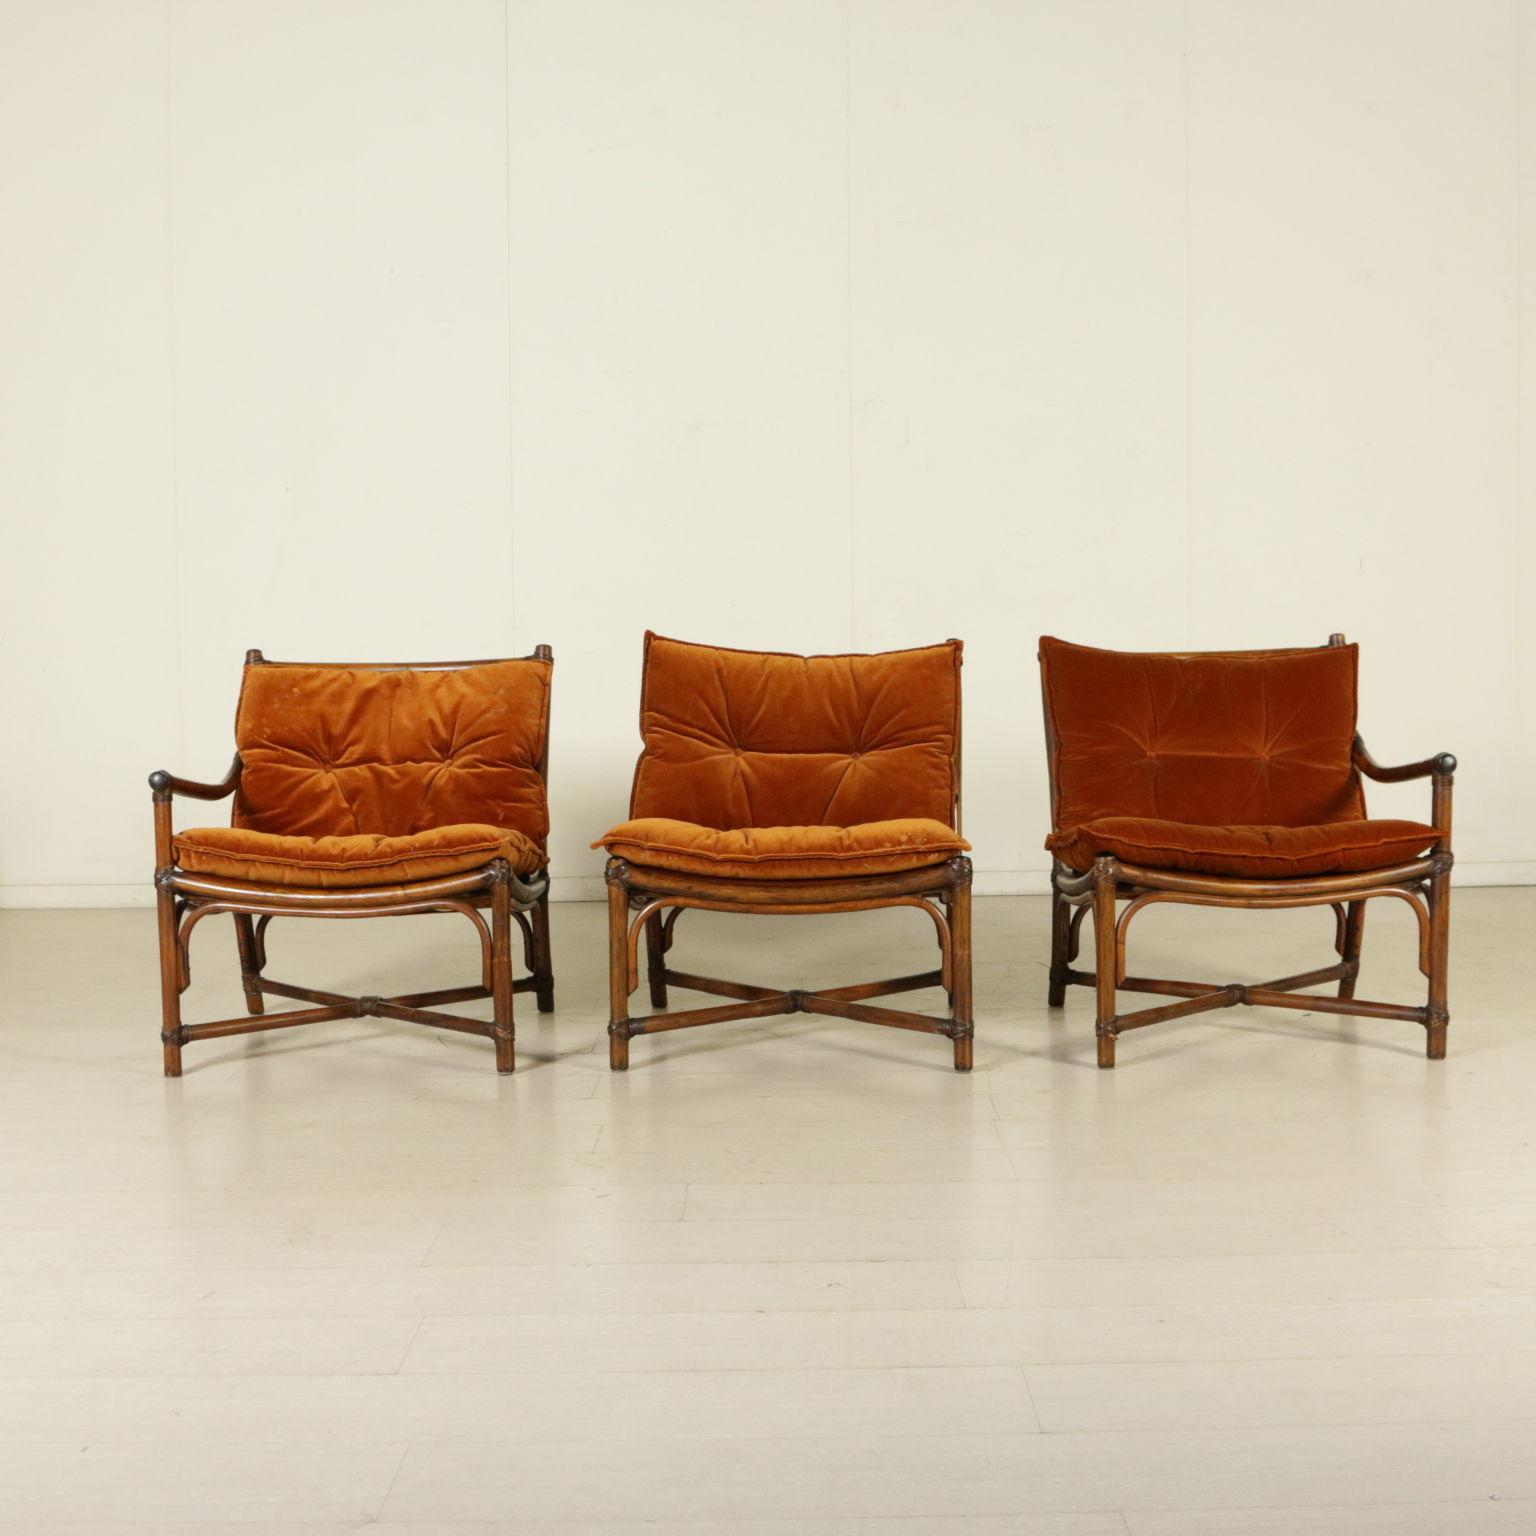 emejing canap ann e 70 pictures. Black Bedroom Furniture Sets. Home Design Ideas